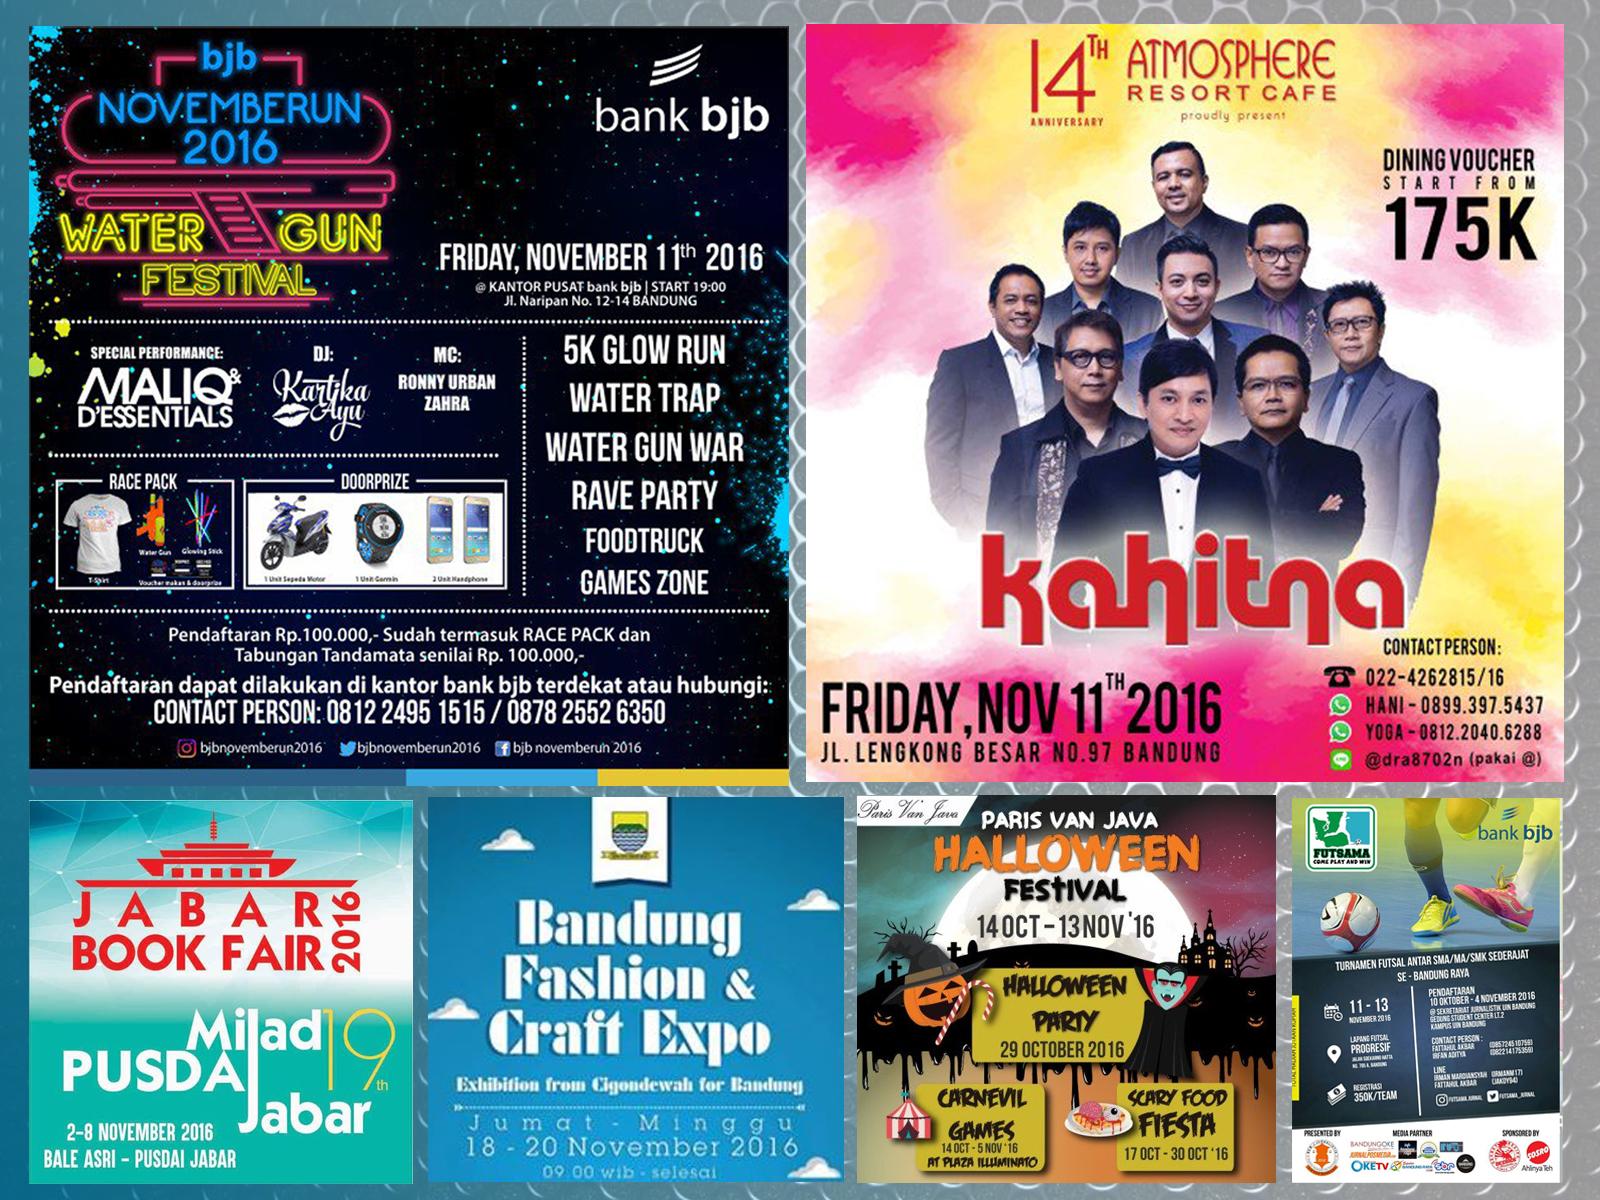 Jadwal Event Bandung Bulan November 2016